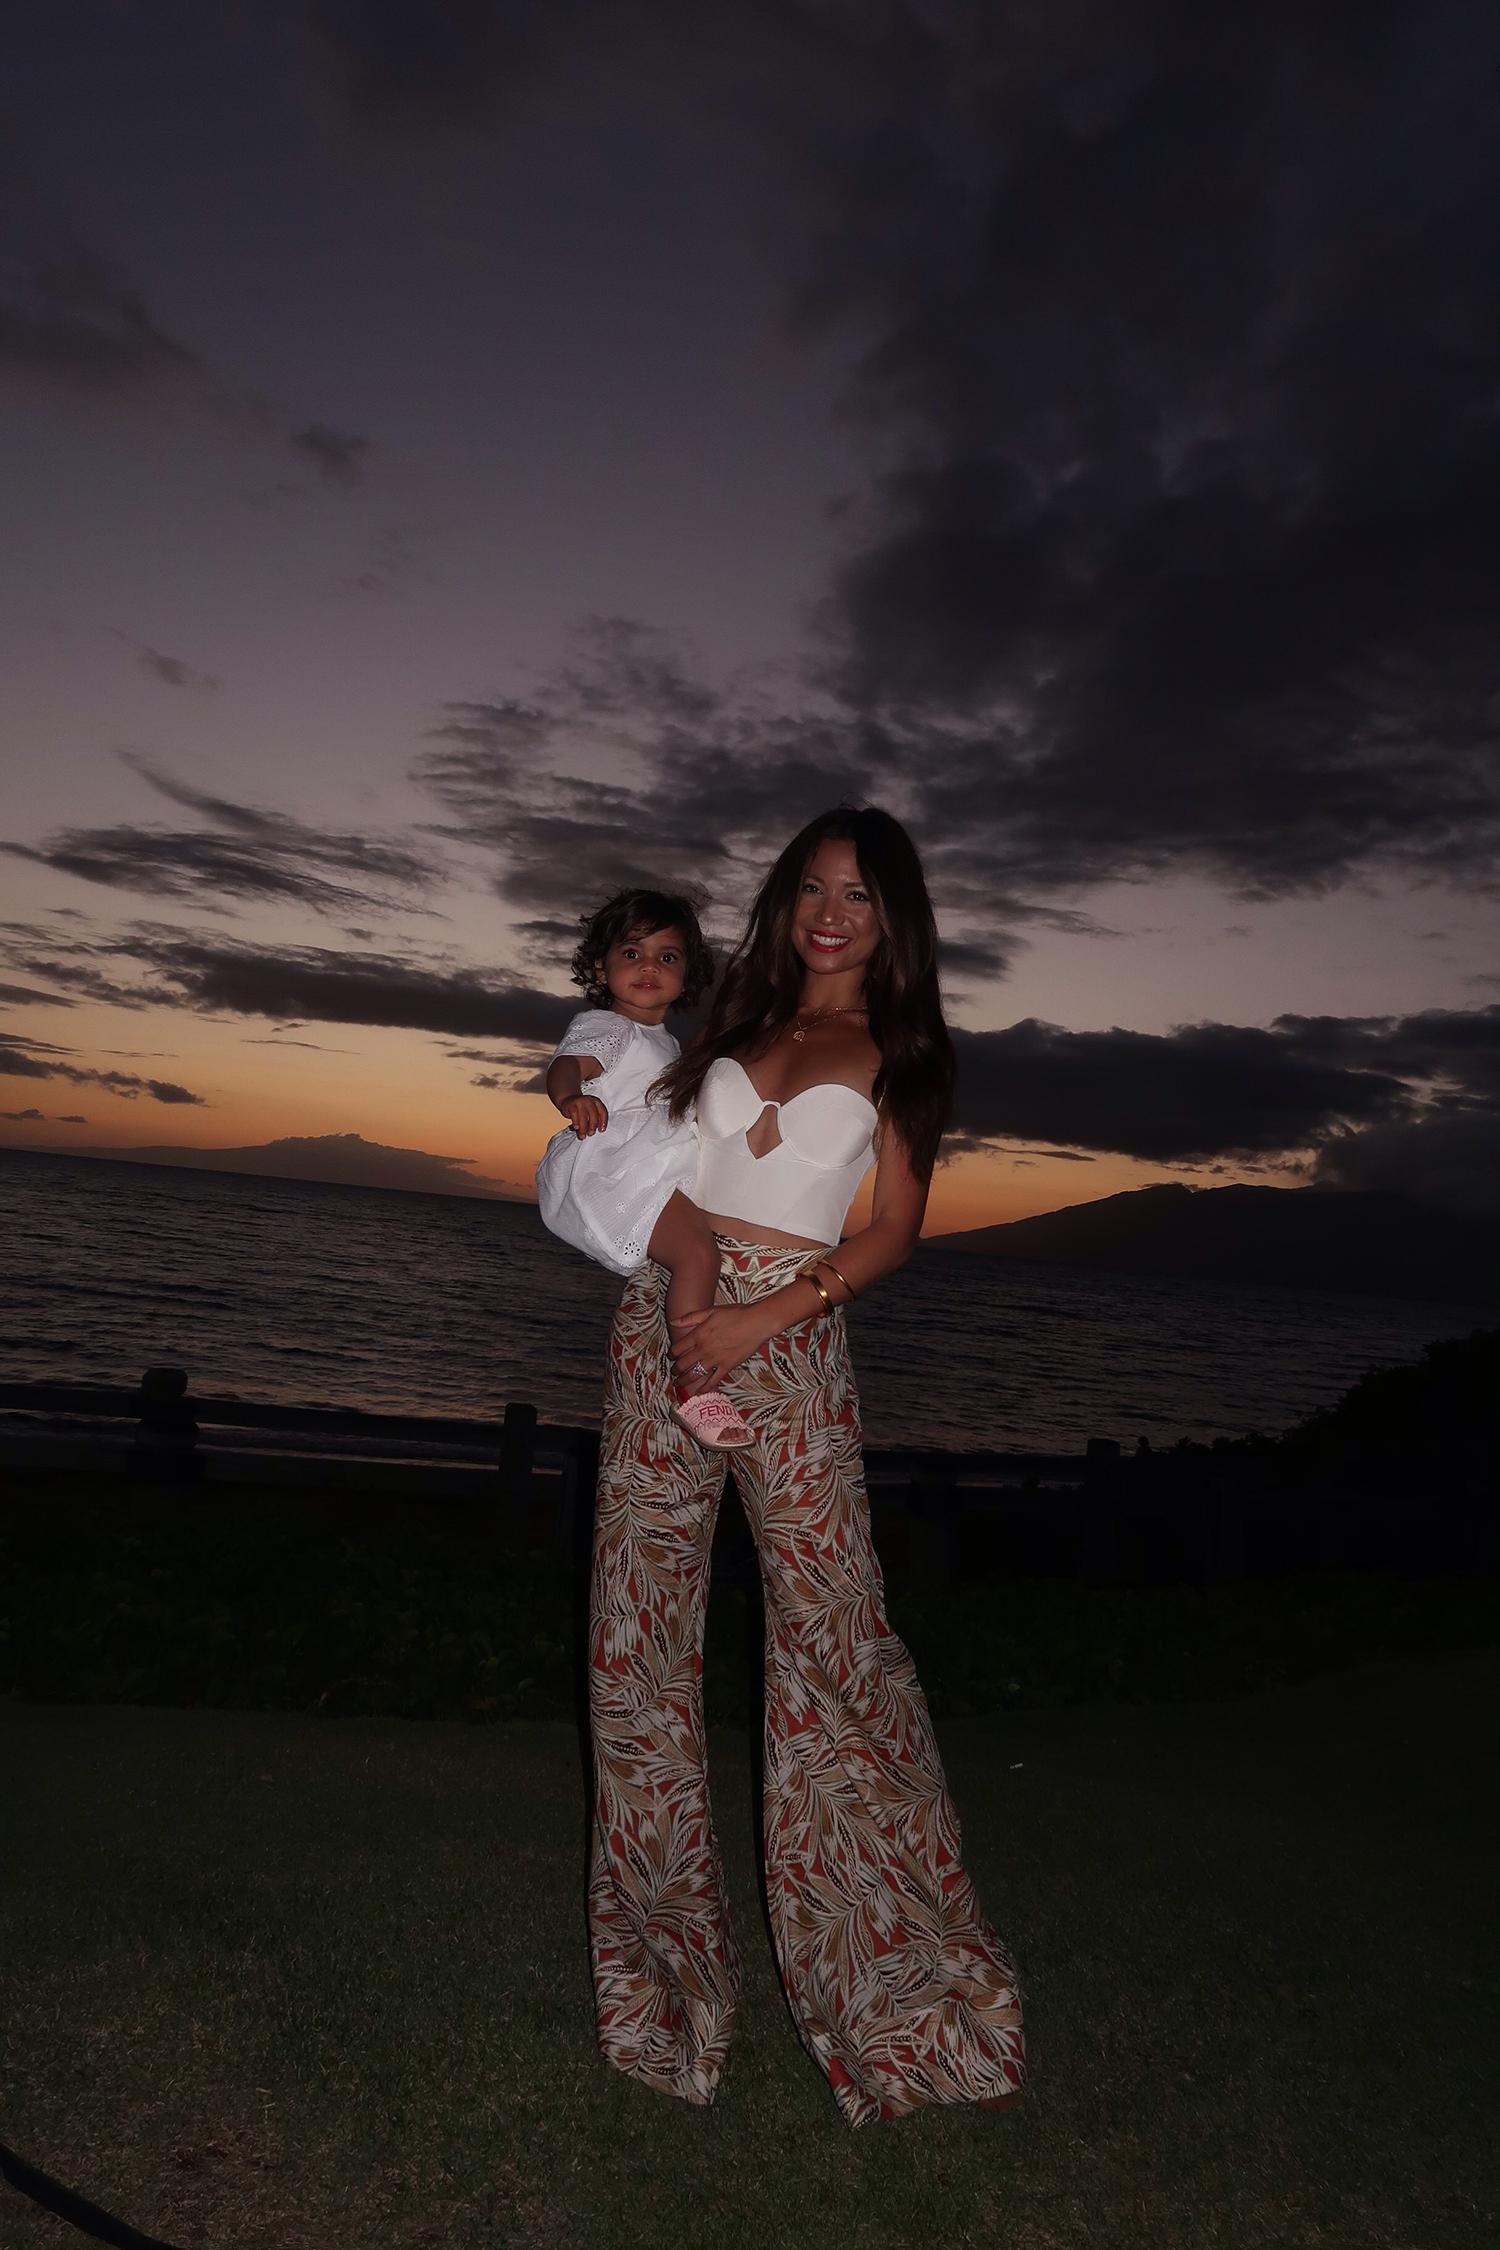 Jessi Malay at the Andaz Maui Resort